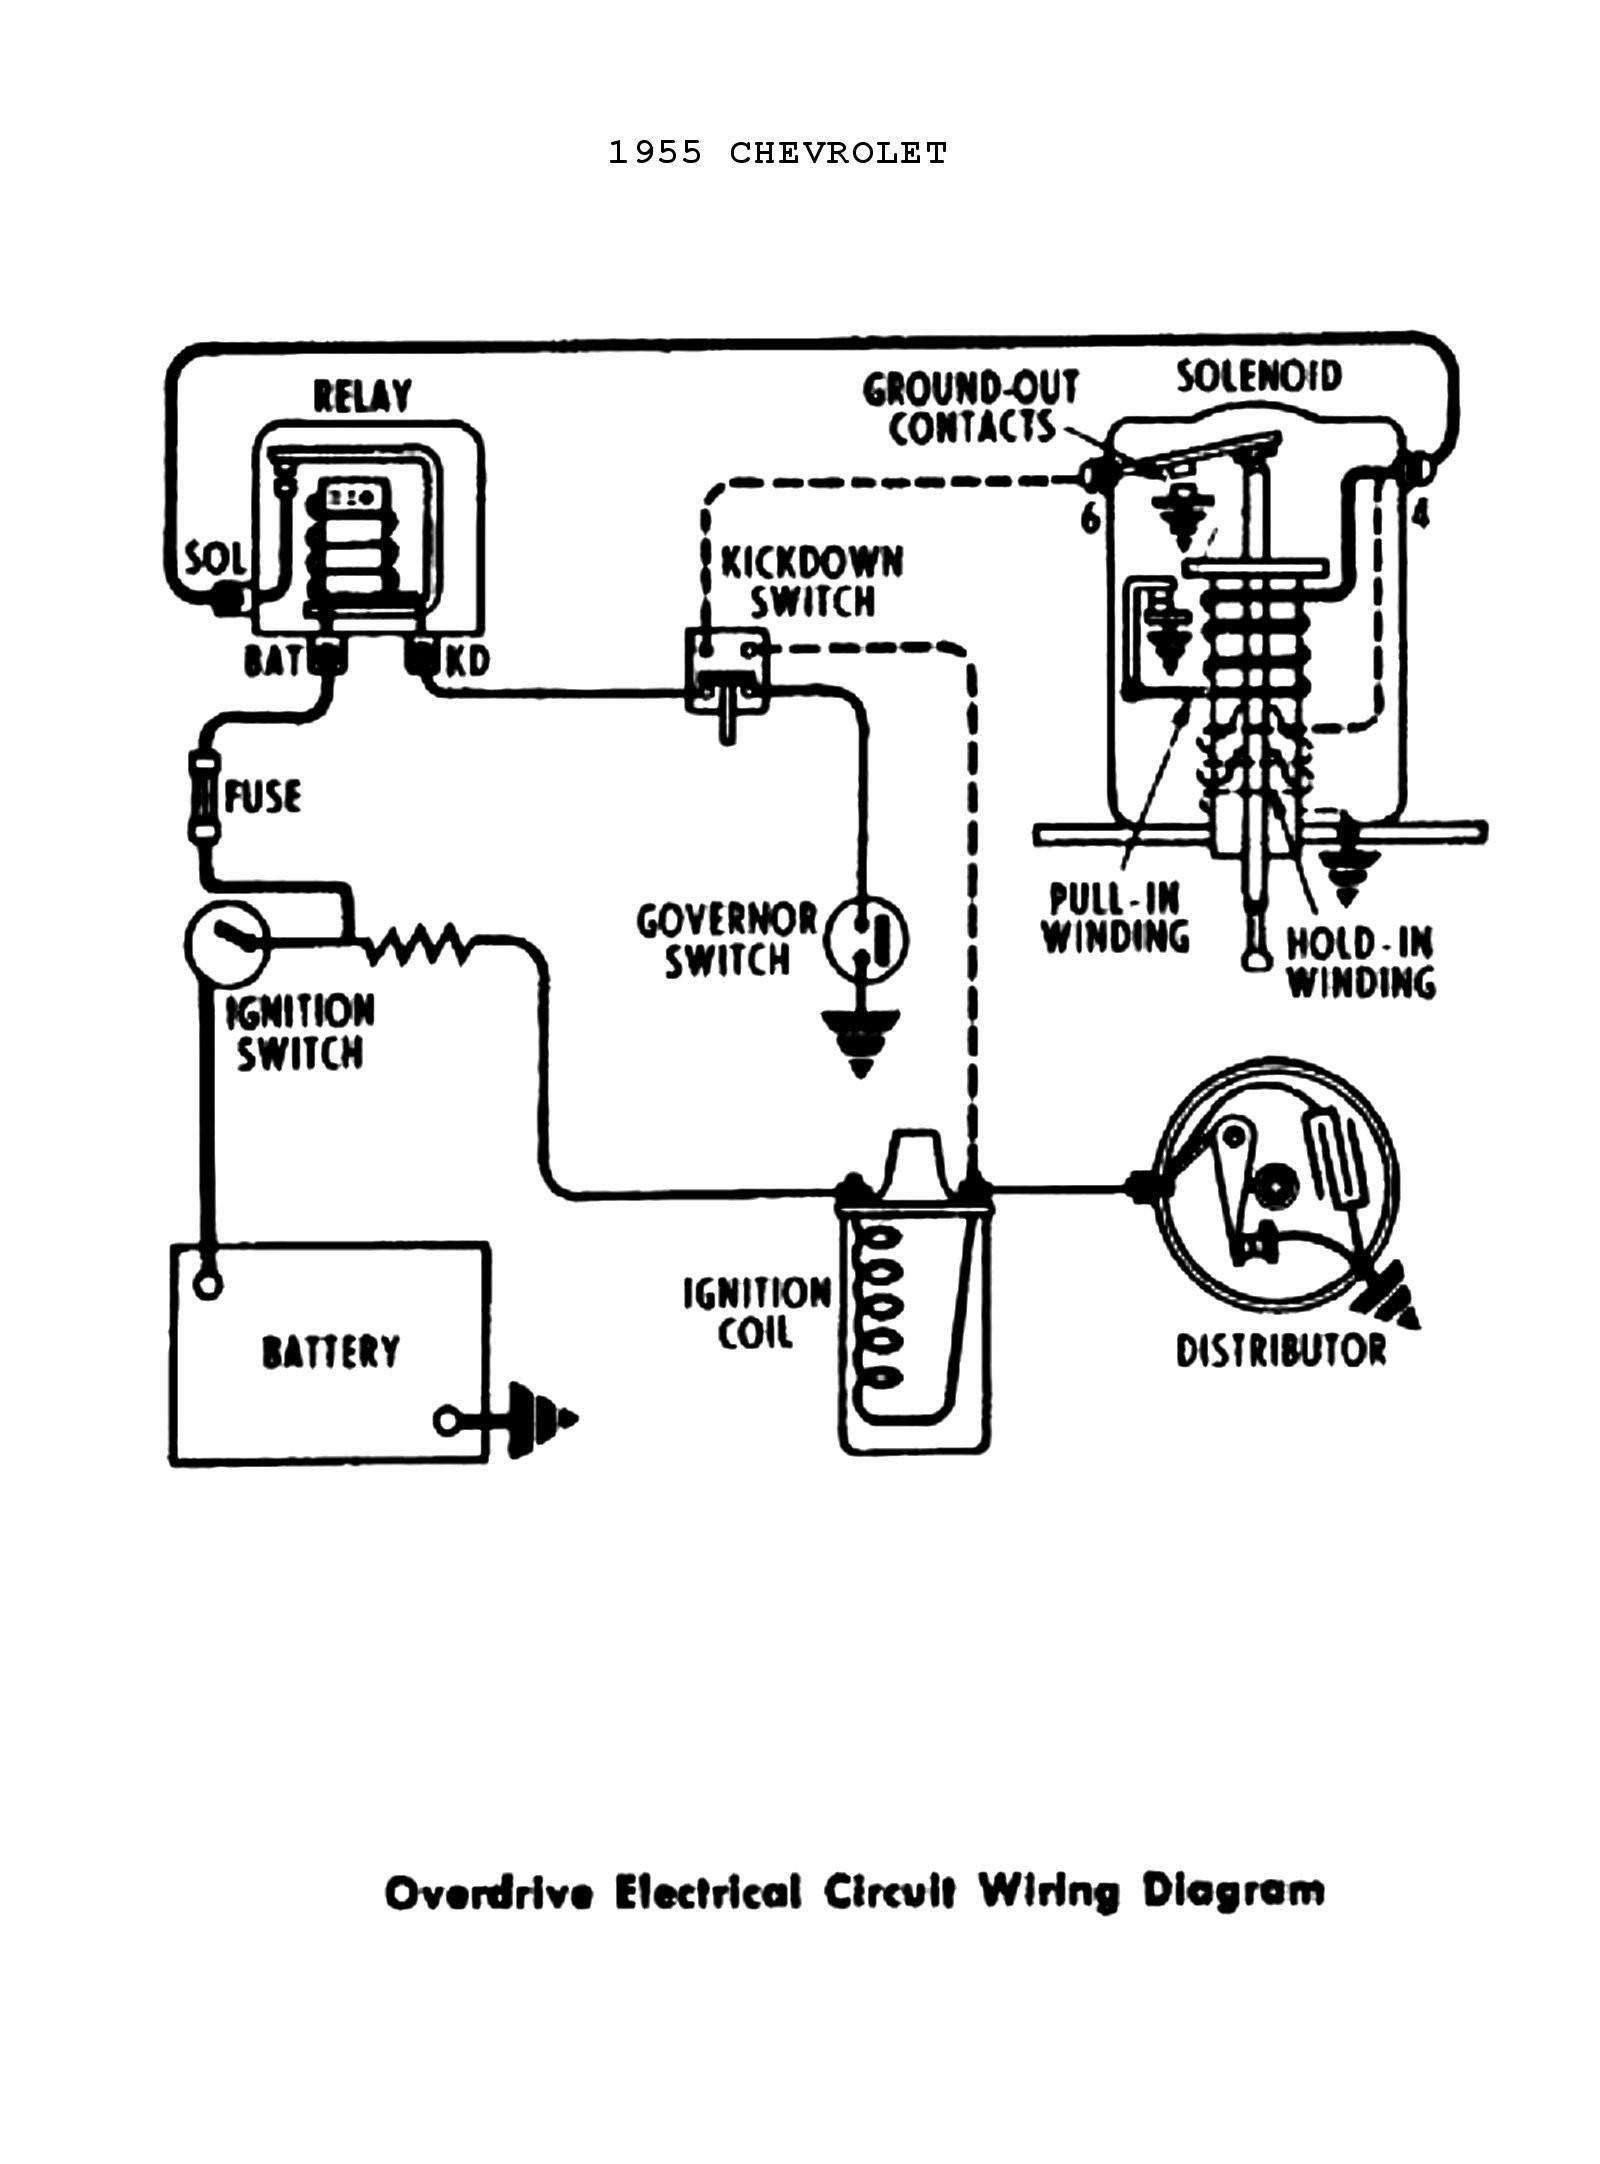 Ignition Coil Wiring Diagram Unique Chevy Ignition Coil Wiring Lawn Mower Ignition Switch Wiring Diagram